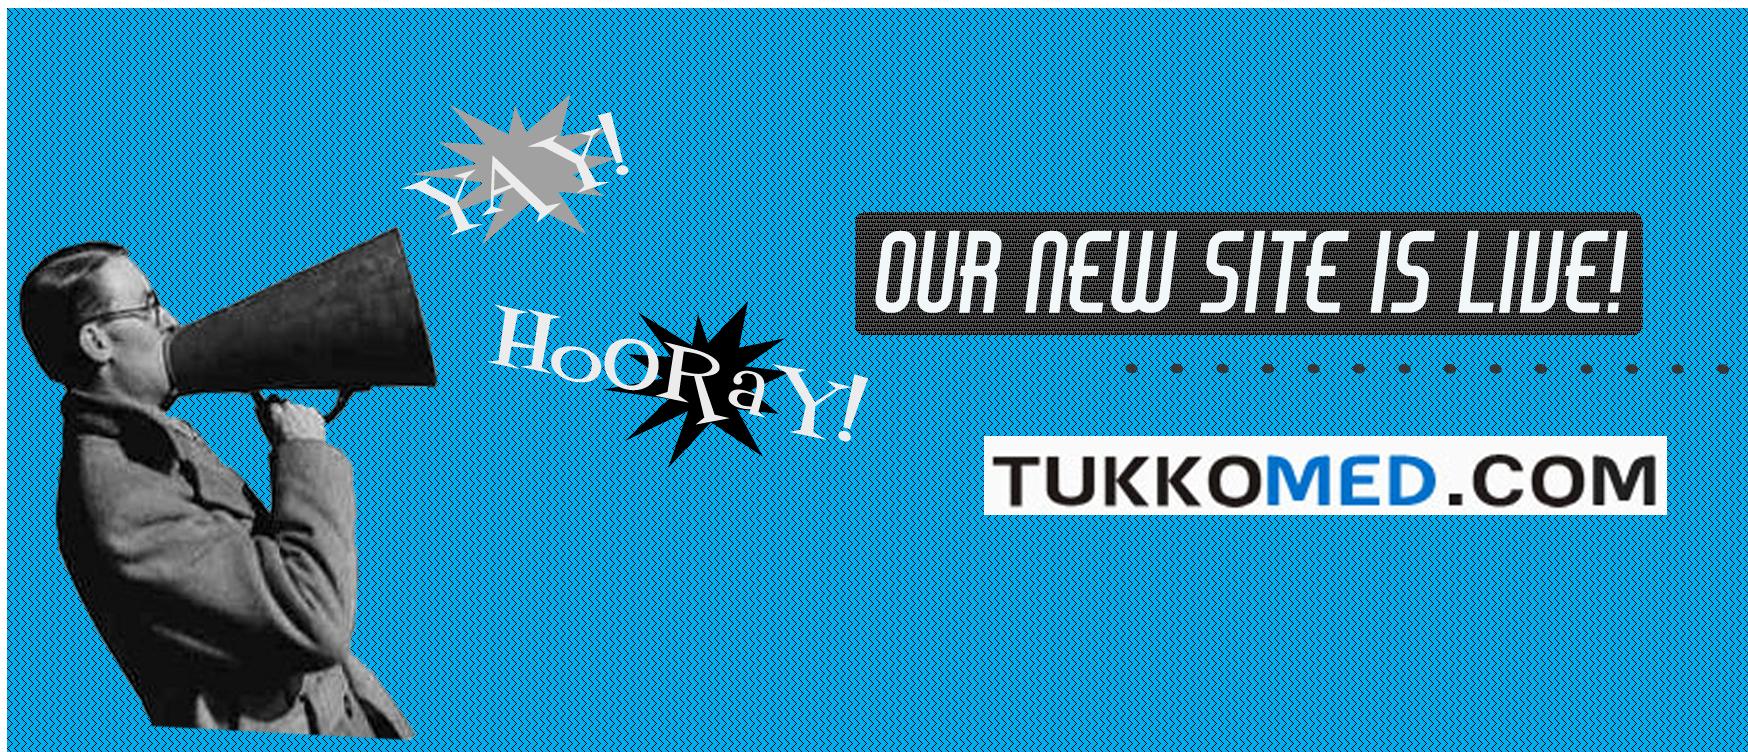 Newly Designed Website Announcement